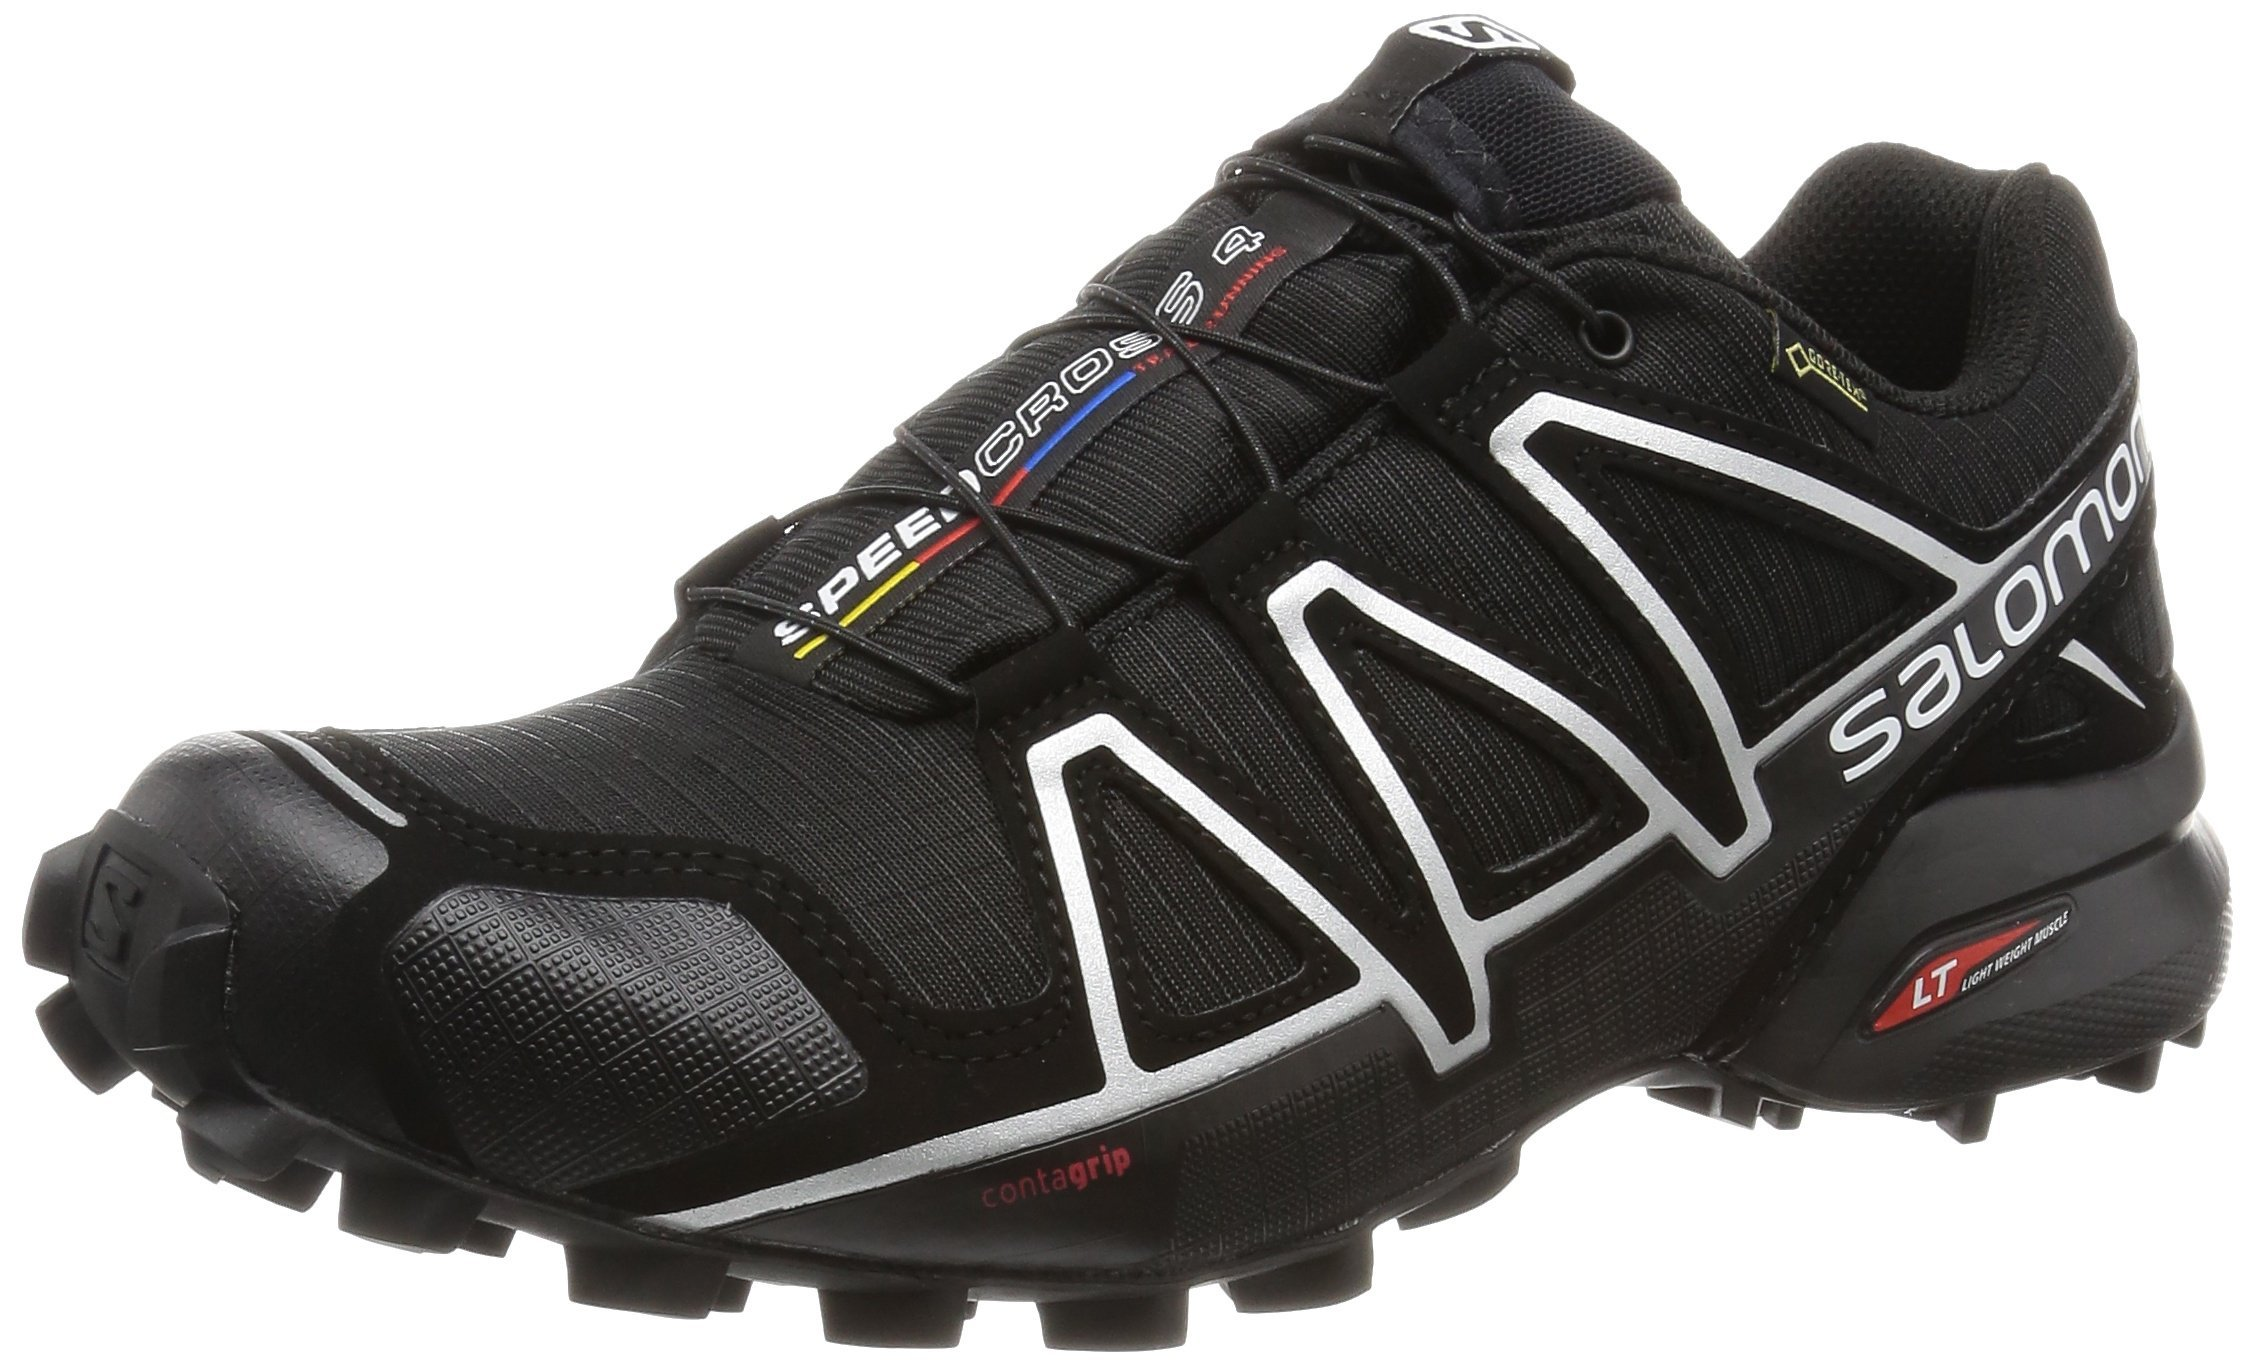 fa0293a41741 Galleon - Salomon Men s SPEEDCROSS 4 GTX Trail Running Shoe ...